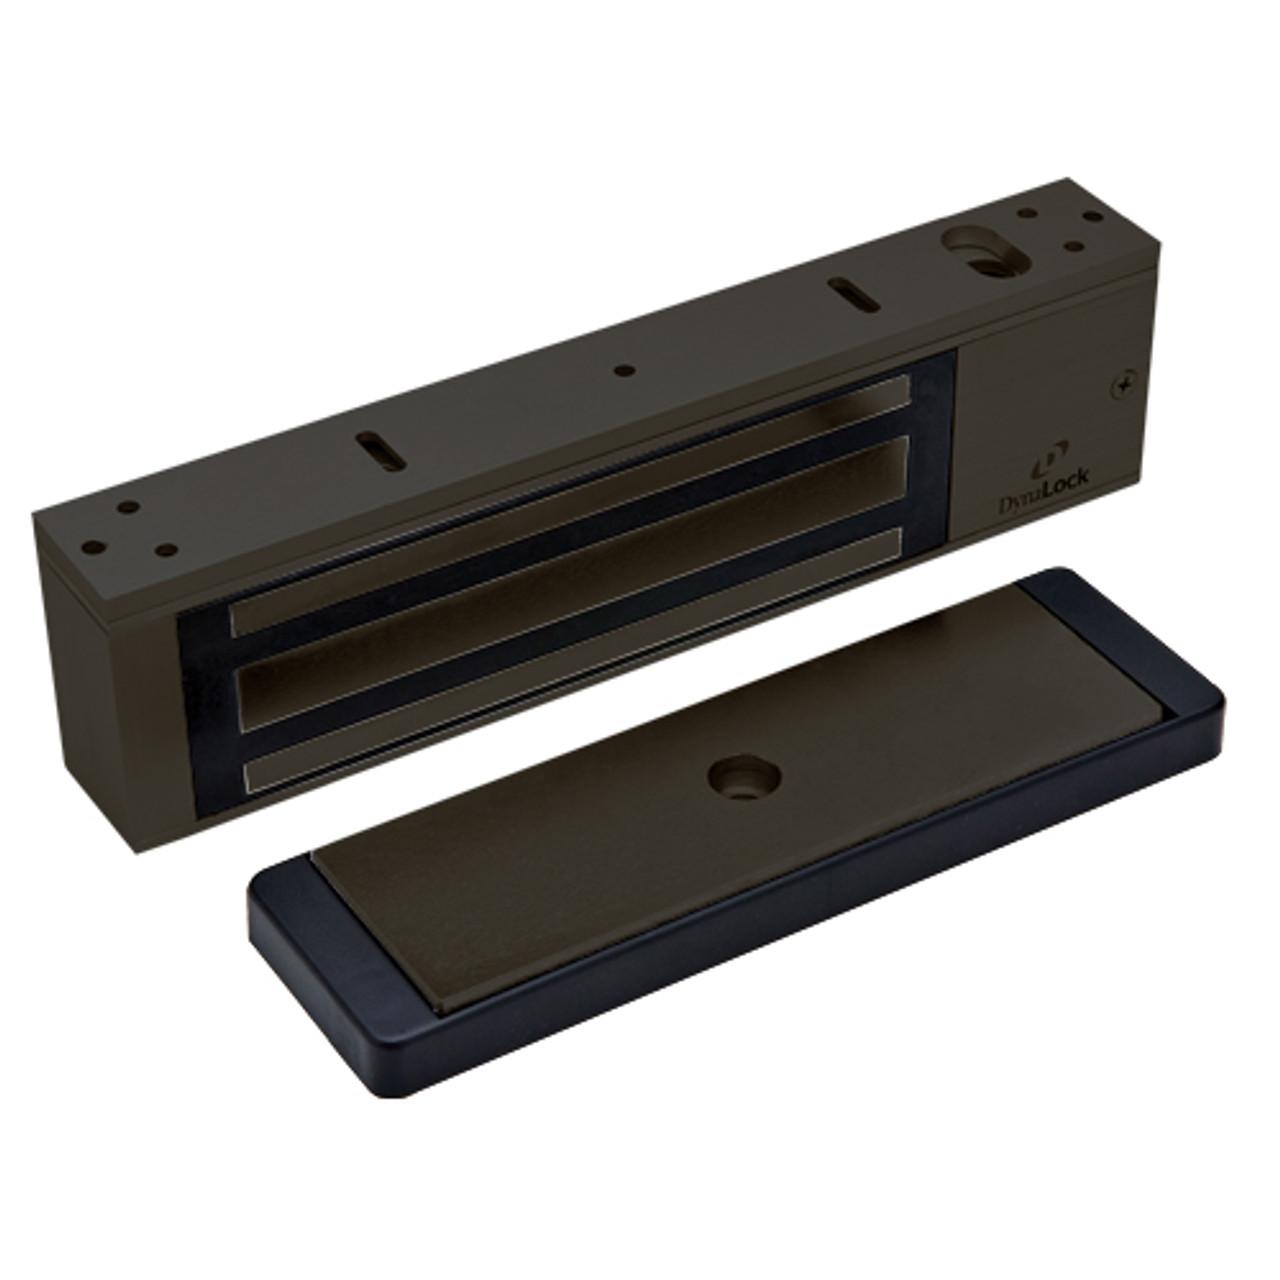 2011TJ20-US10B DynaLock 2000 Series 1200 LB Holding Force Single Inswing Electromagnetic Lock in Oil Rubbed Bronze